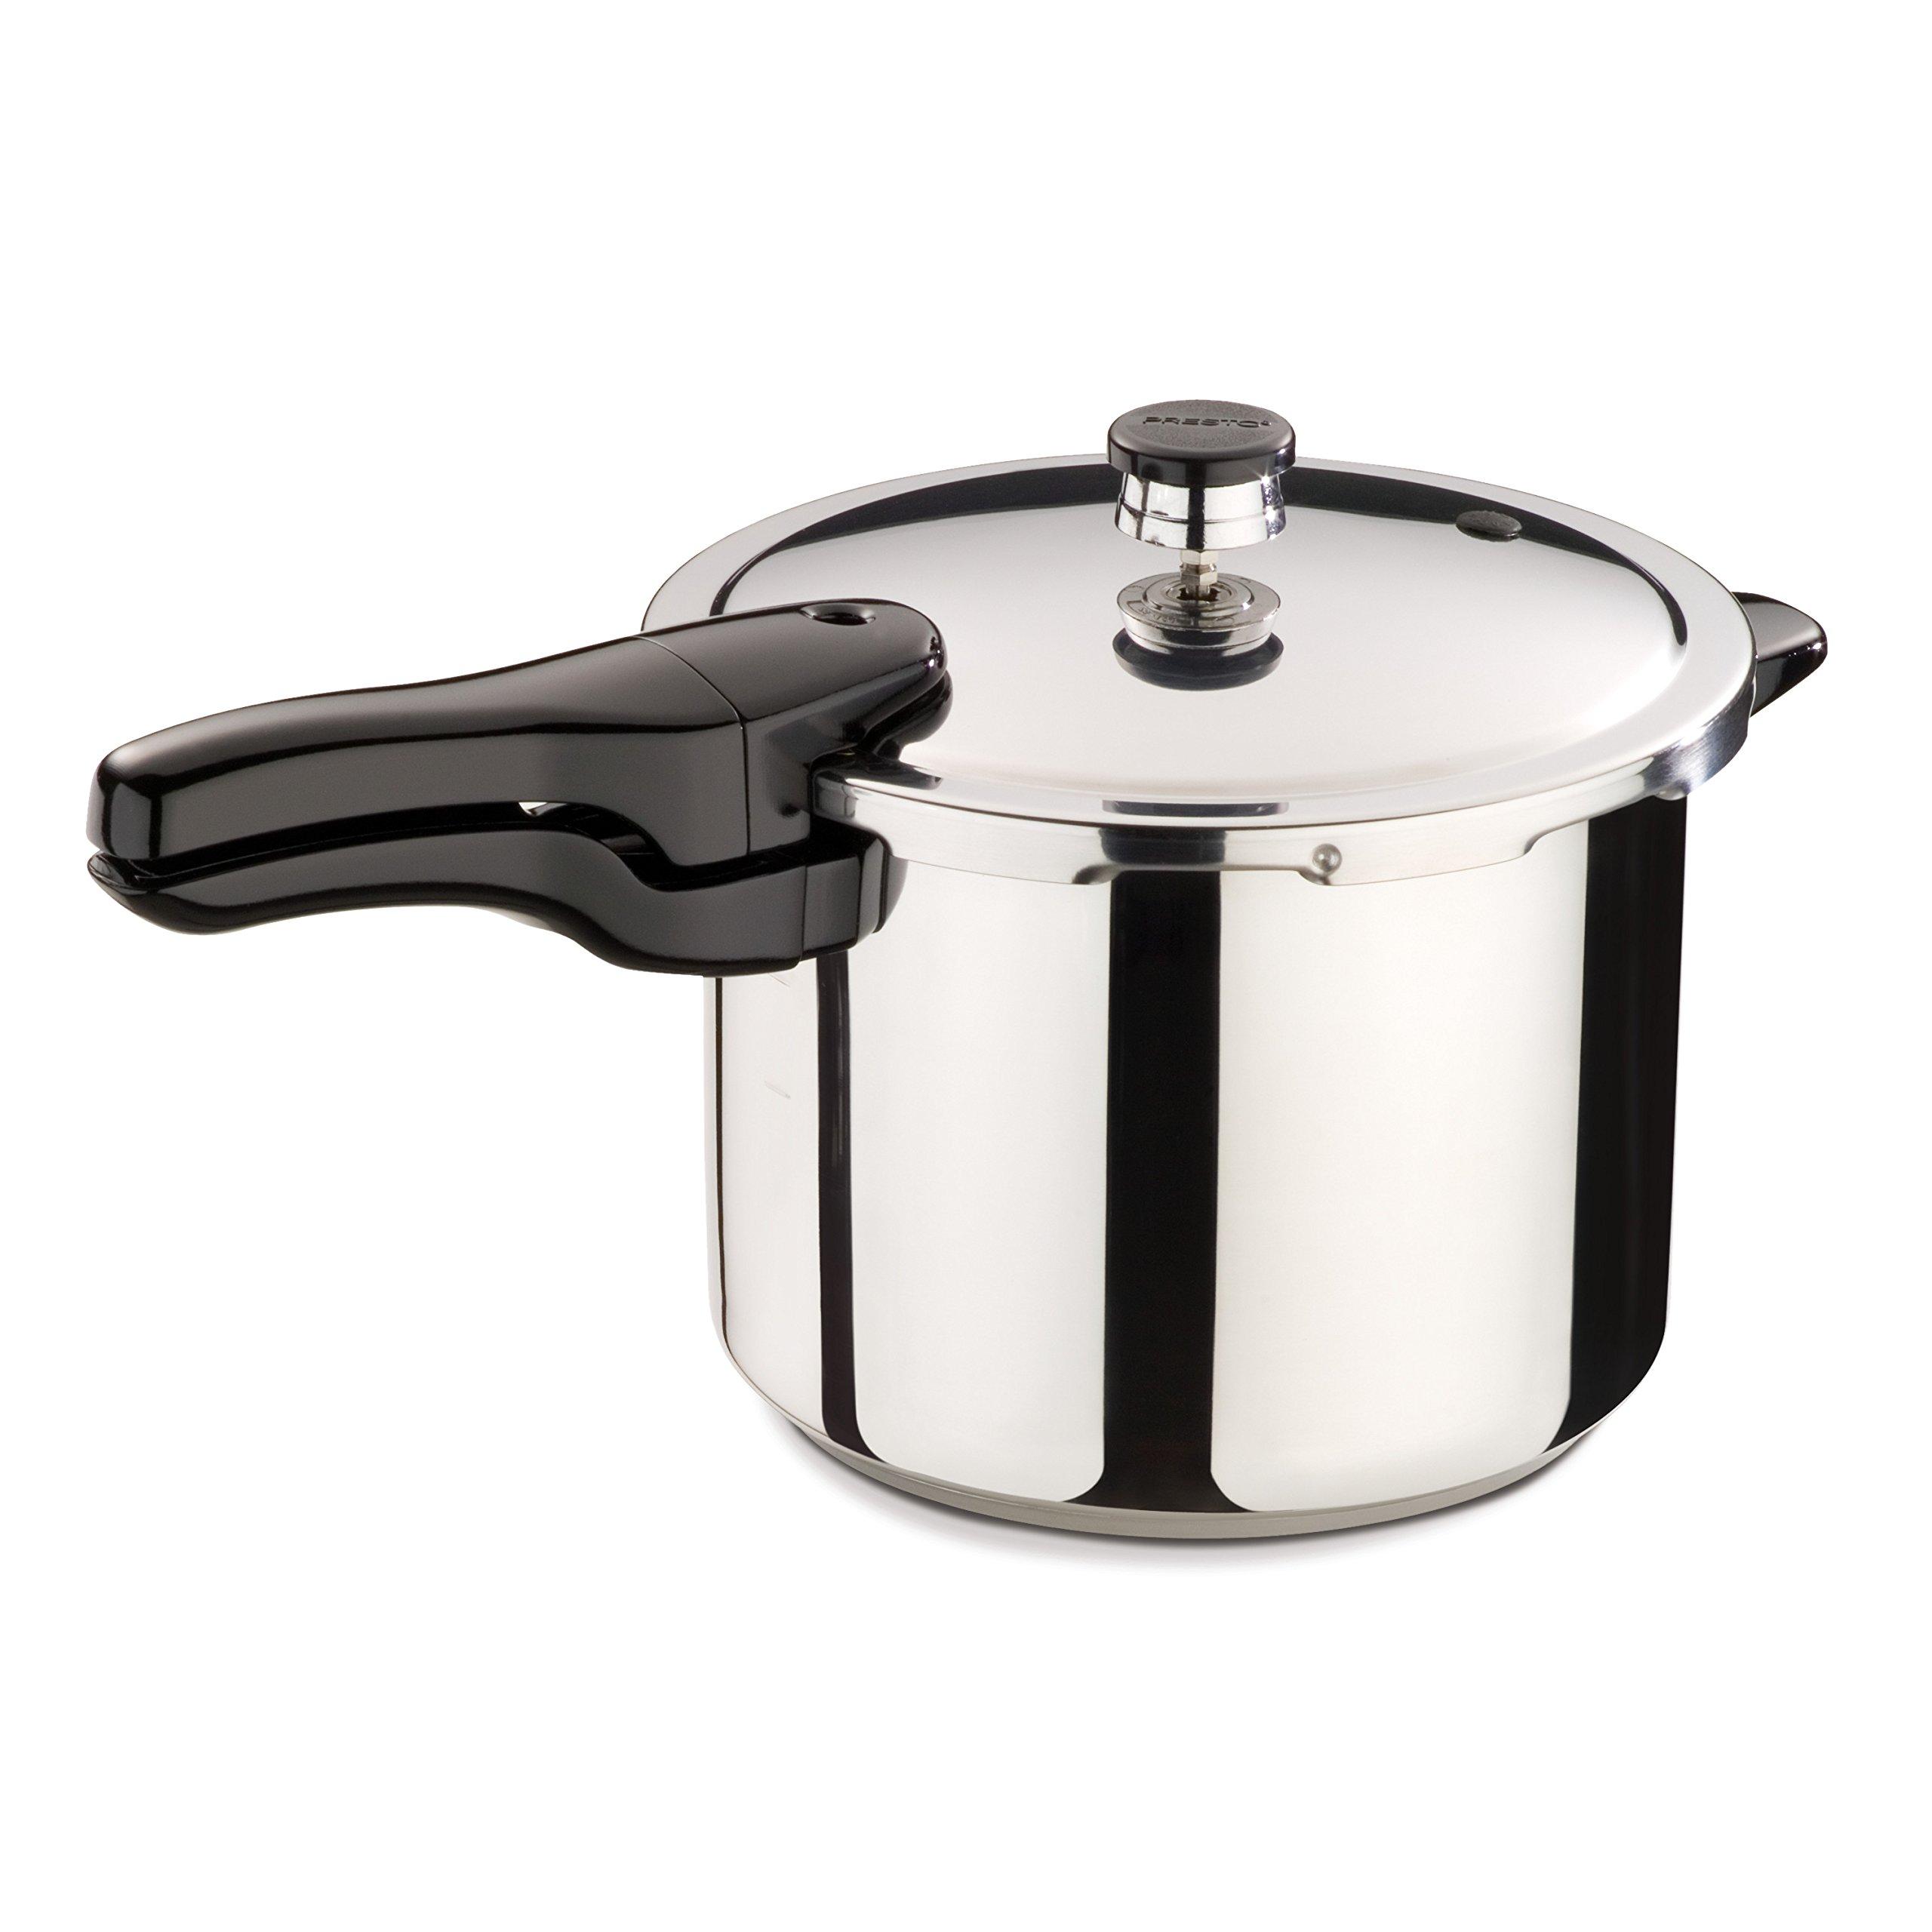 Presto 01362 6-Quart Stainless Steel Pressure Cooker by Presto